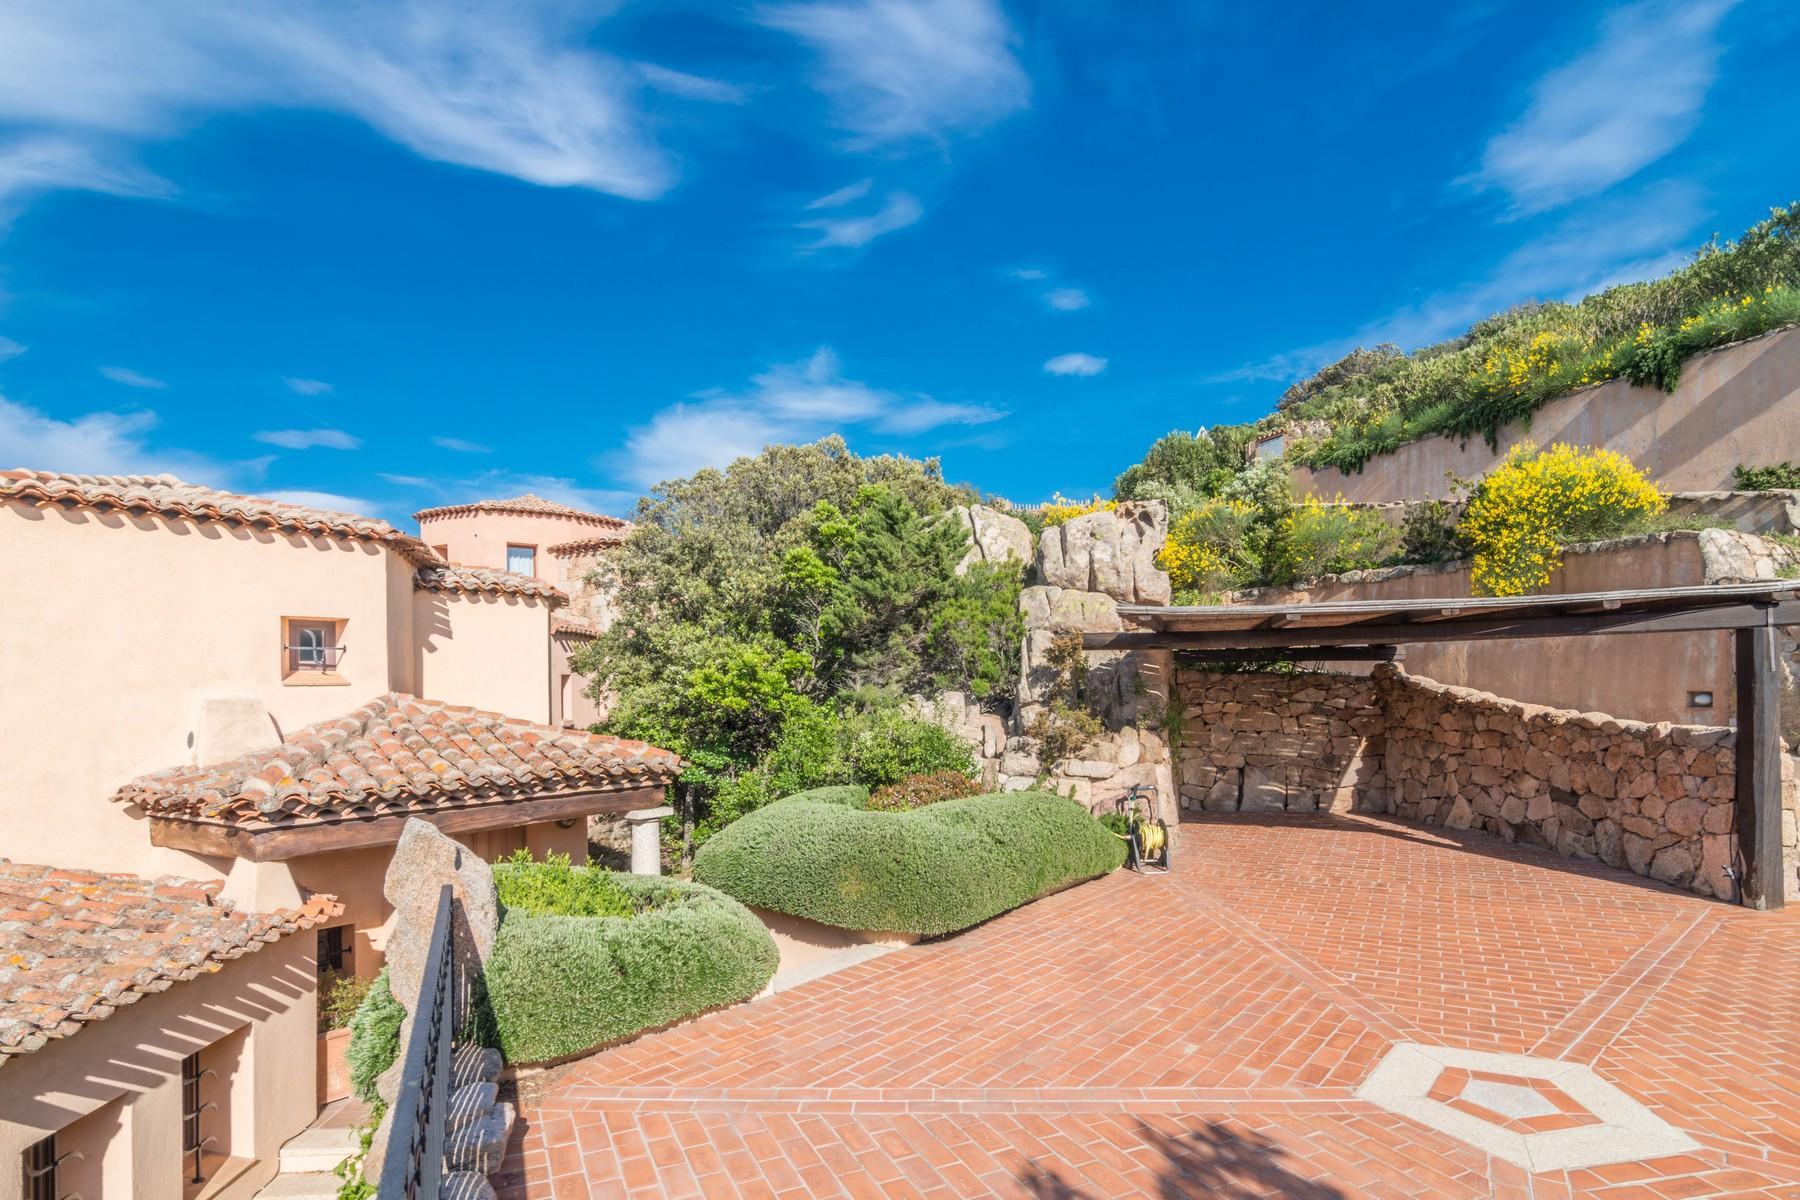 Porto Cervo Abbiadori Splendide villa jumelée avec vue sur le golfe de Pevero - 37